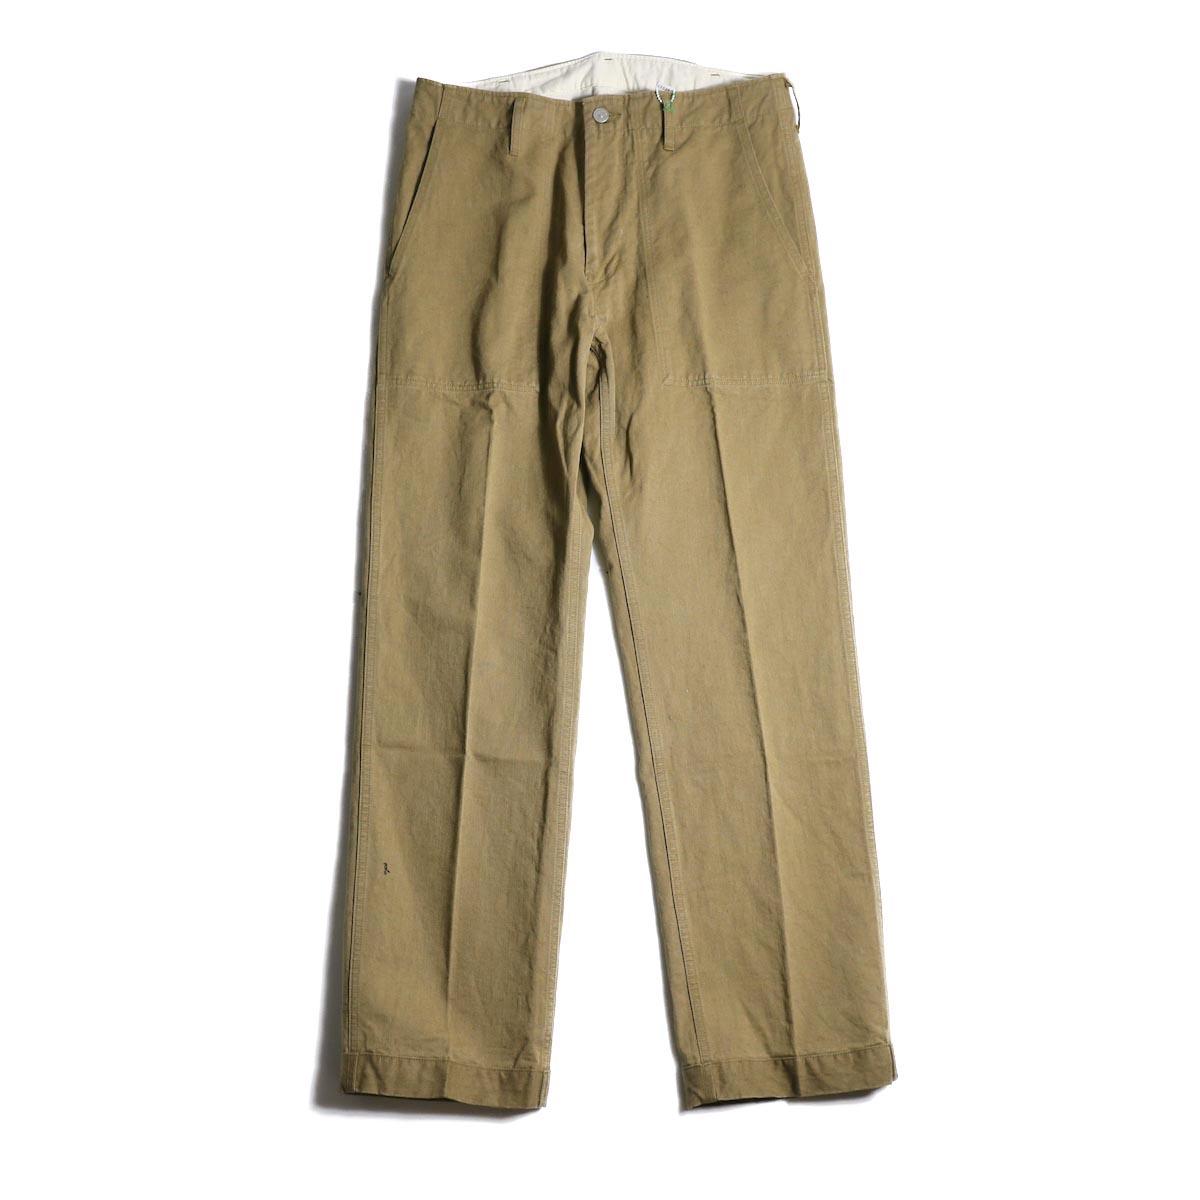 visvim / TRADE WIND PANTS (Khaki)